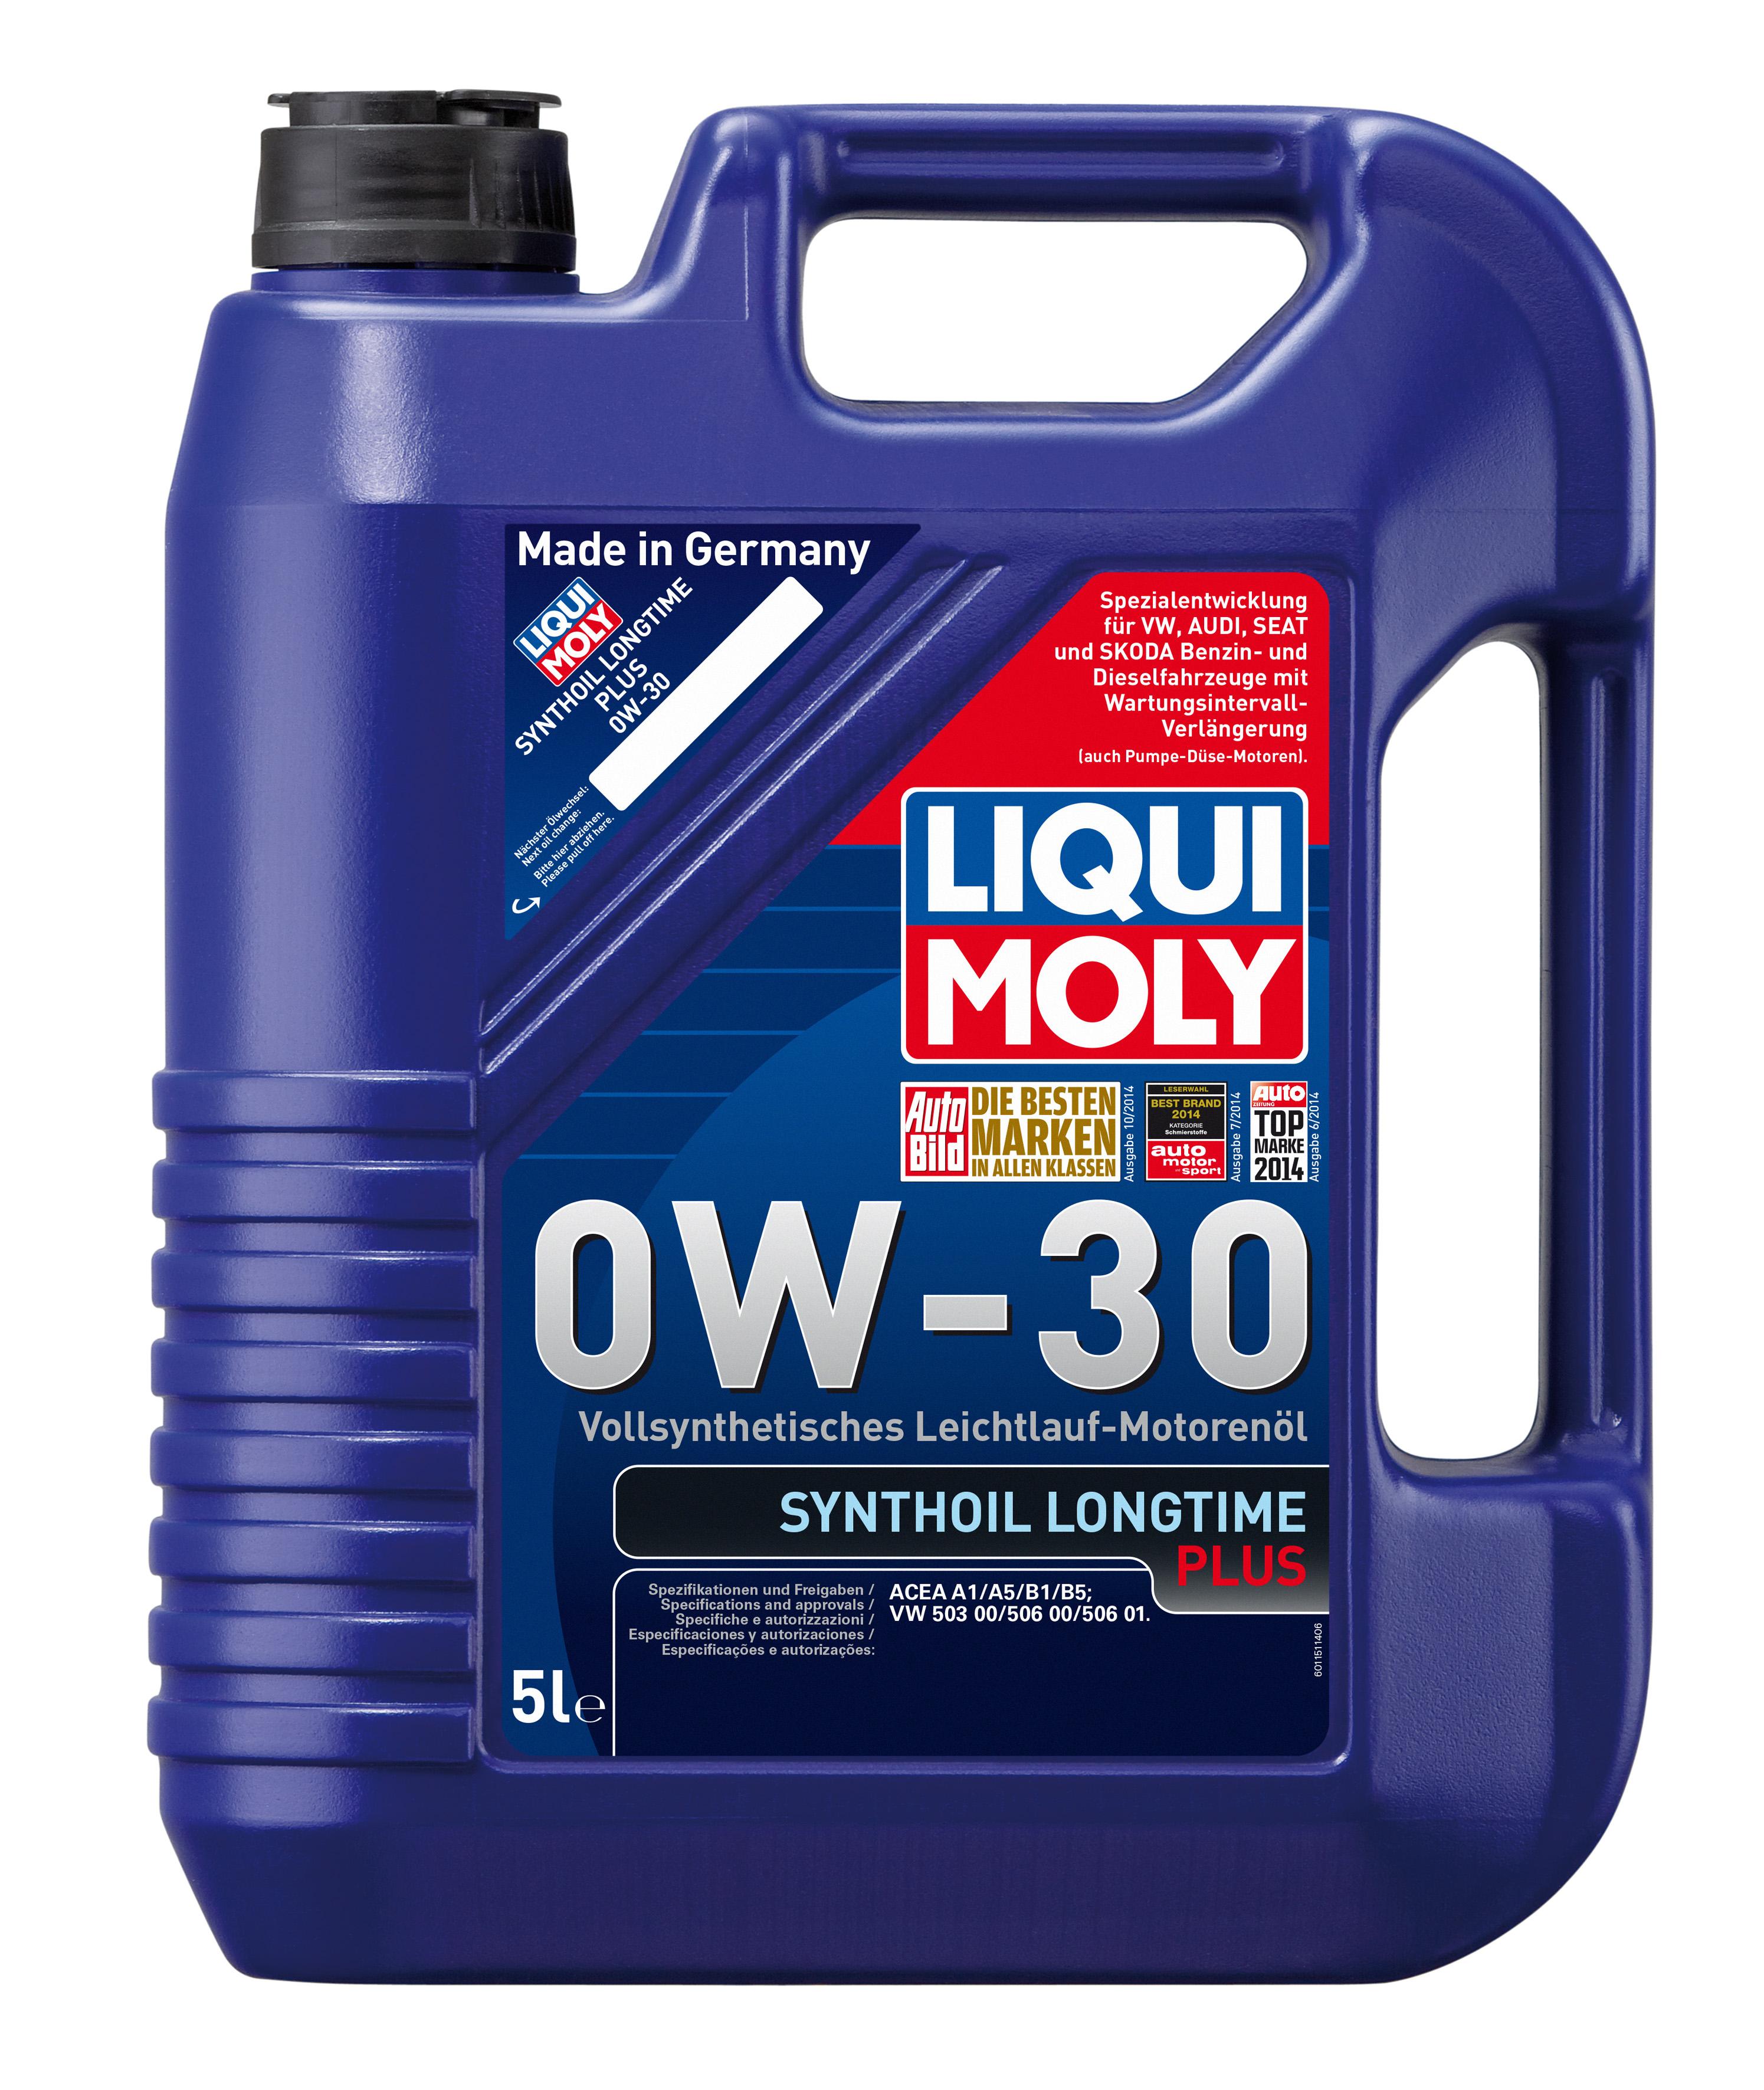 ULEI MOTOR LIQUI MOLY 1151 SYNTHOIL LONGTIME PLUS 0W30 5L